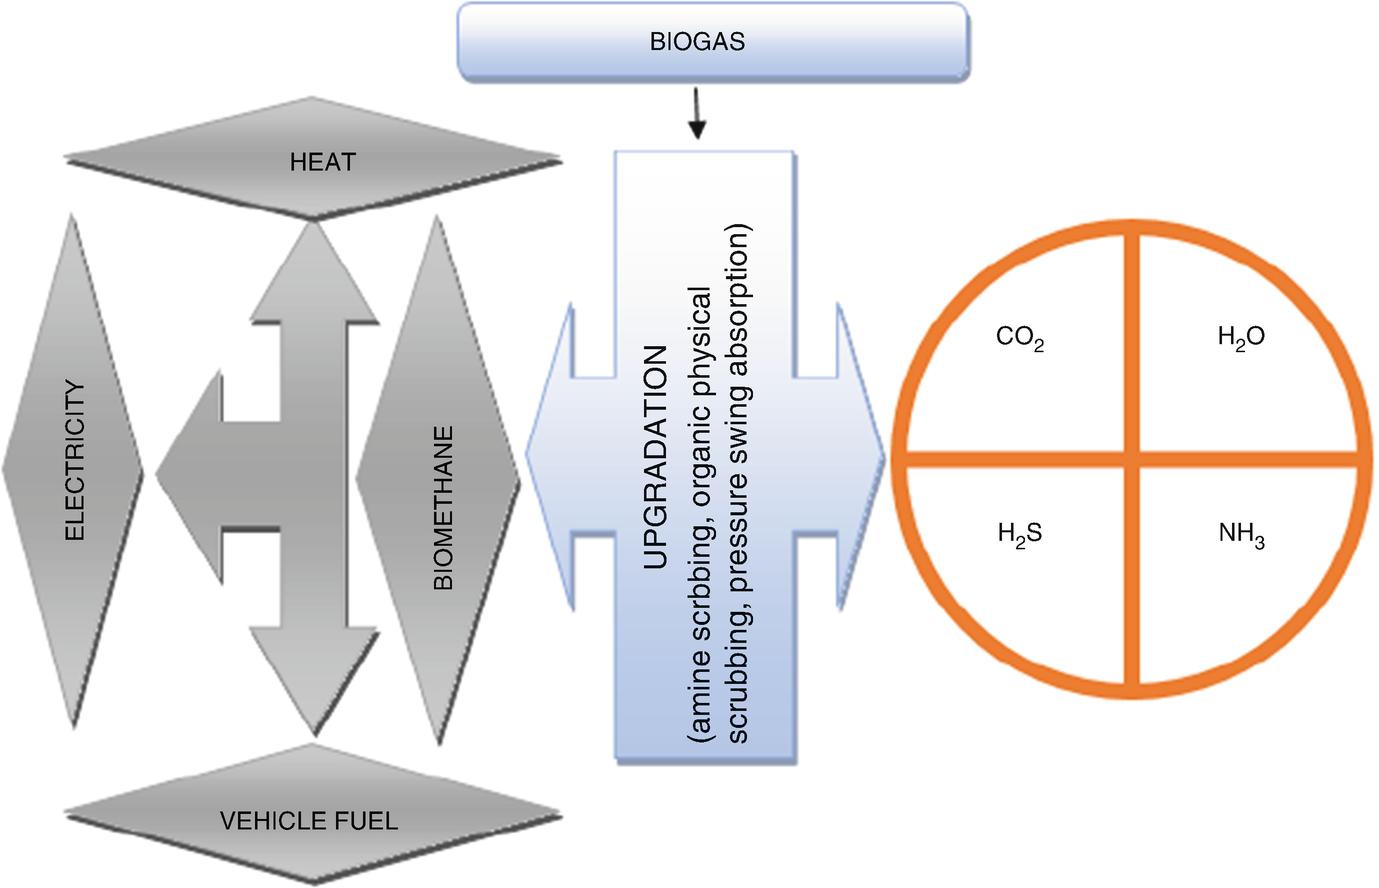 Conversion Of Lignocellulosic Feedstocks Into Biogas Springerlink Digester Construction Diagram Systematic Fig 78 Upgradation And Utilization